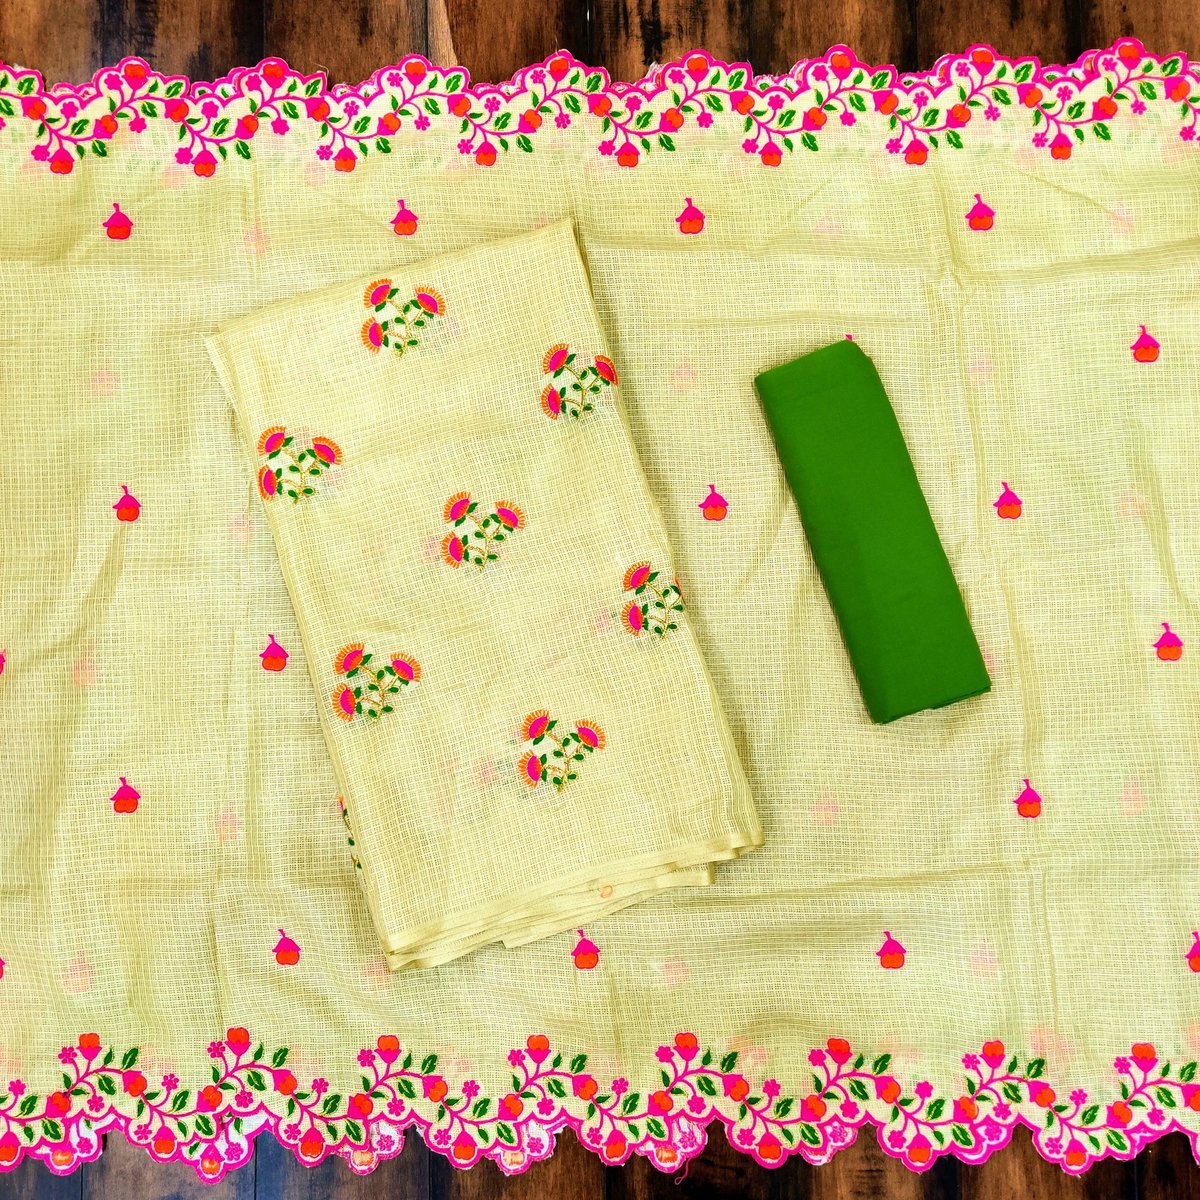 Dress Material consisting of Kotak Doria Thread Embroidered Top & Dupatta with Cotton Bottom  #fashion #clothing #apparel #kotadoria #threadwork #embroidered #embroidery #floral #kurta #kurti #dupatta #cotton #bottom #dressmaterial #traditional #ethnic #ethnicwear #indianwearpic.twitter.com/r829Kzb9w8